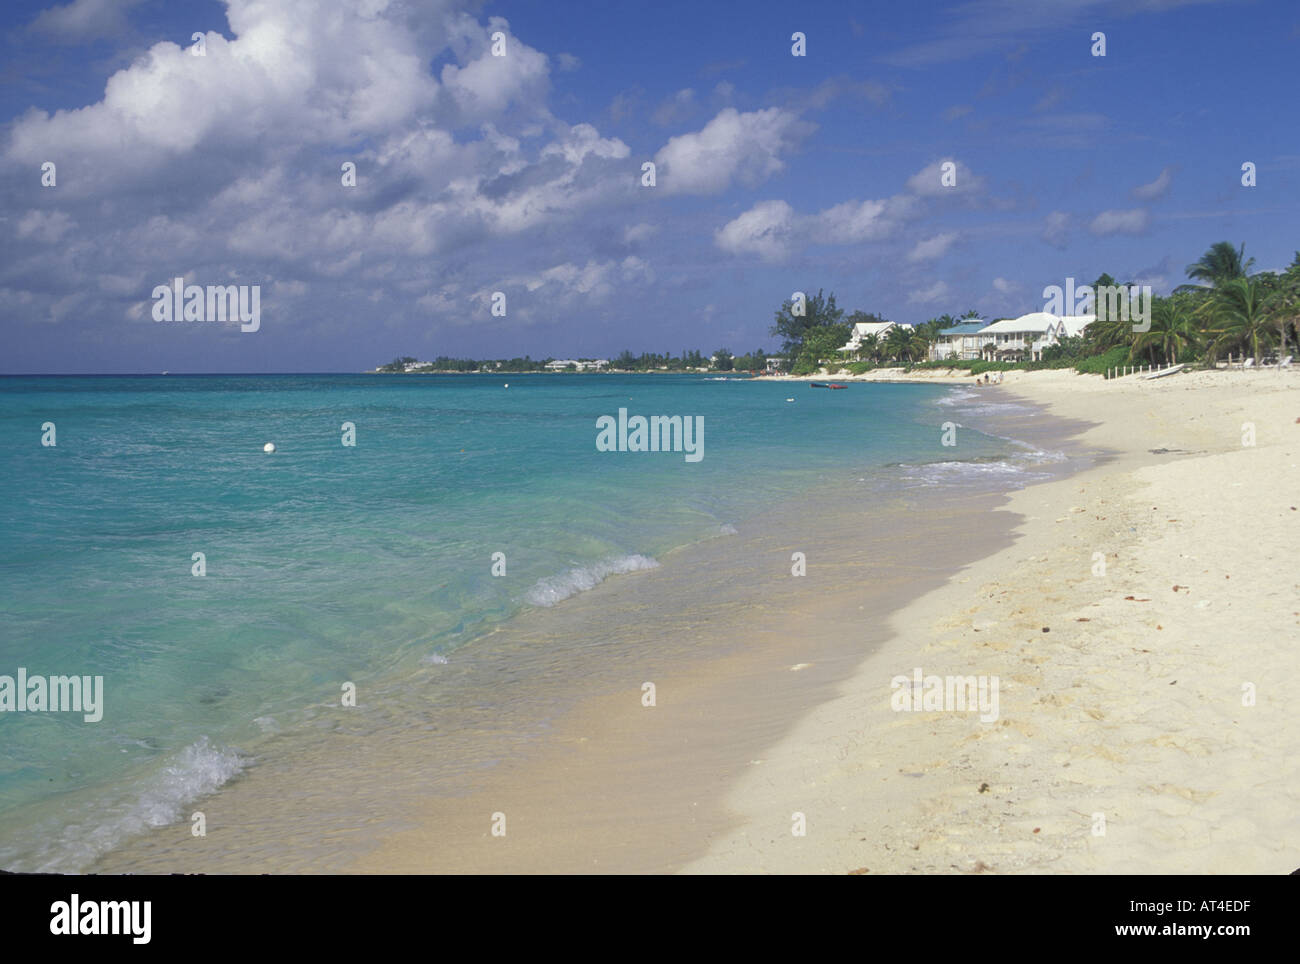 7 mile beach Caribbean sea Grand Cayman Cayman Islands - Stock Image